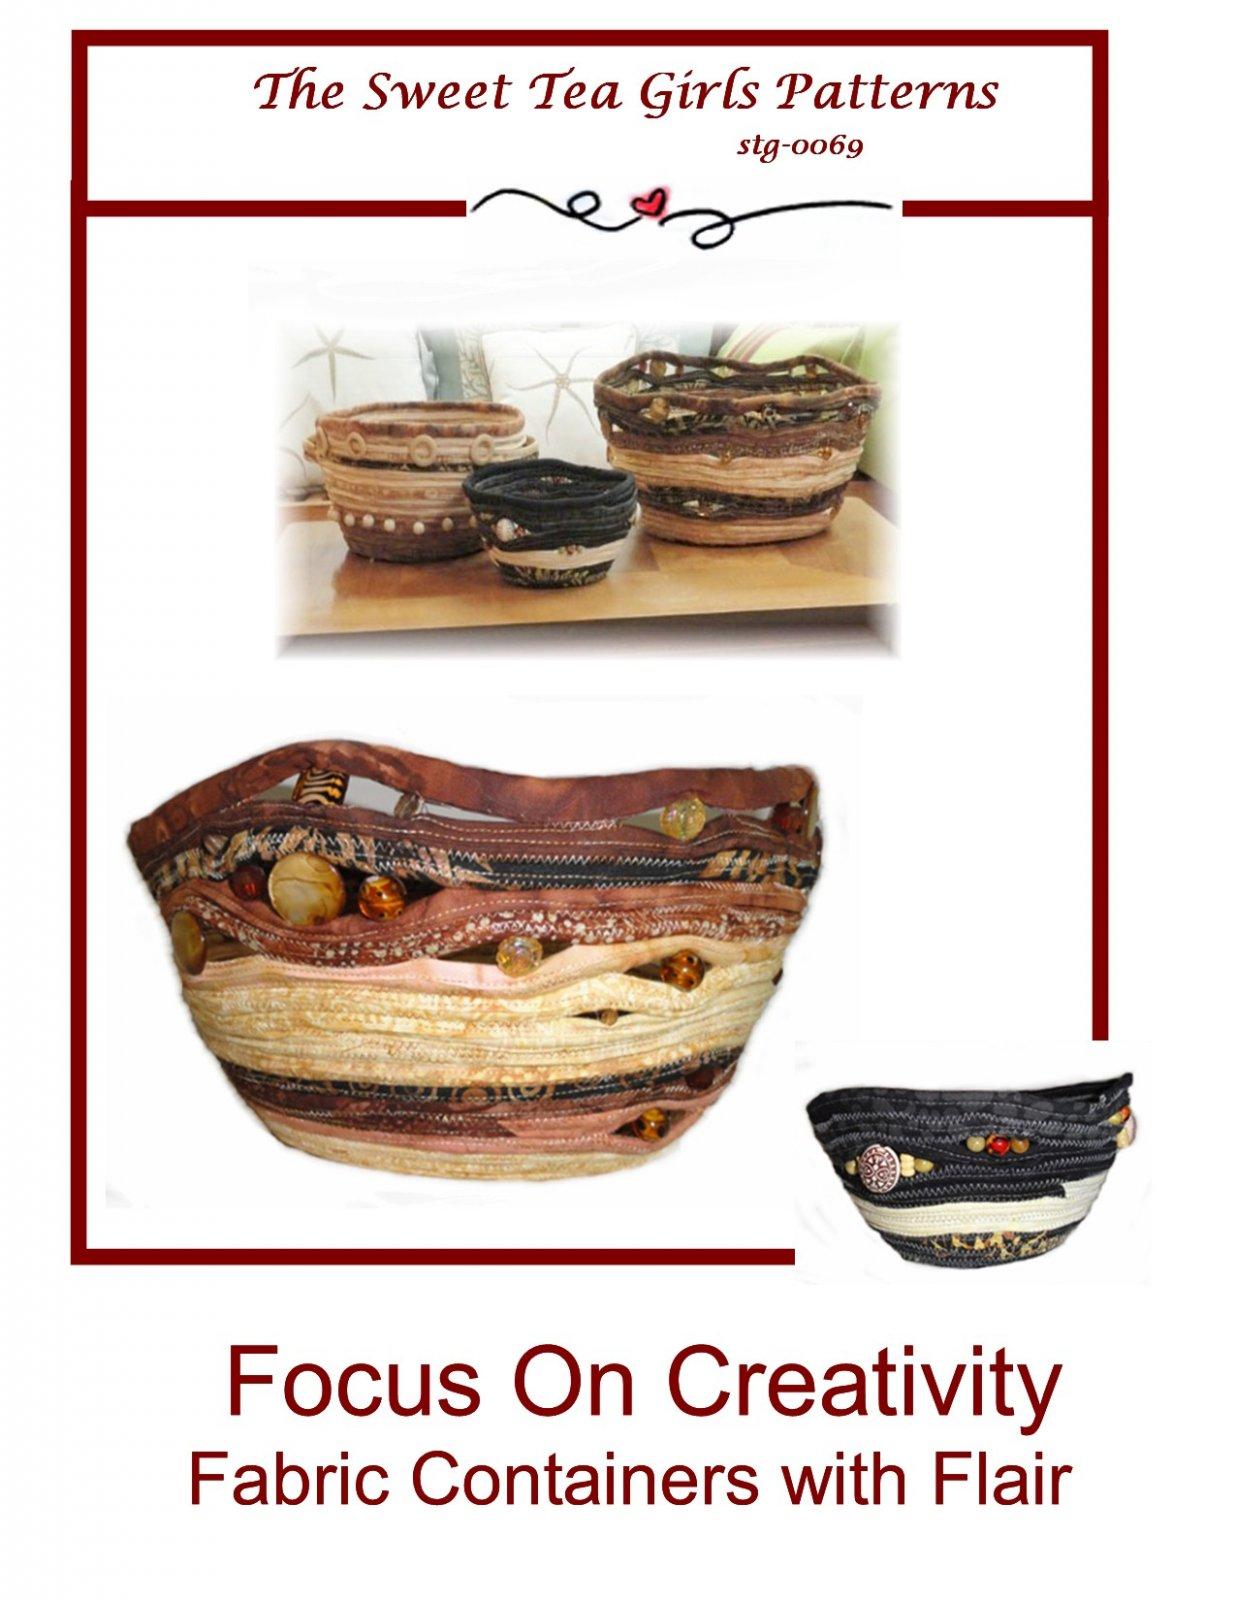 Focus On Creativity Fabric Container